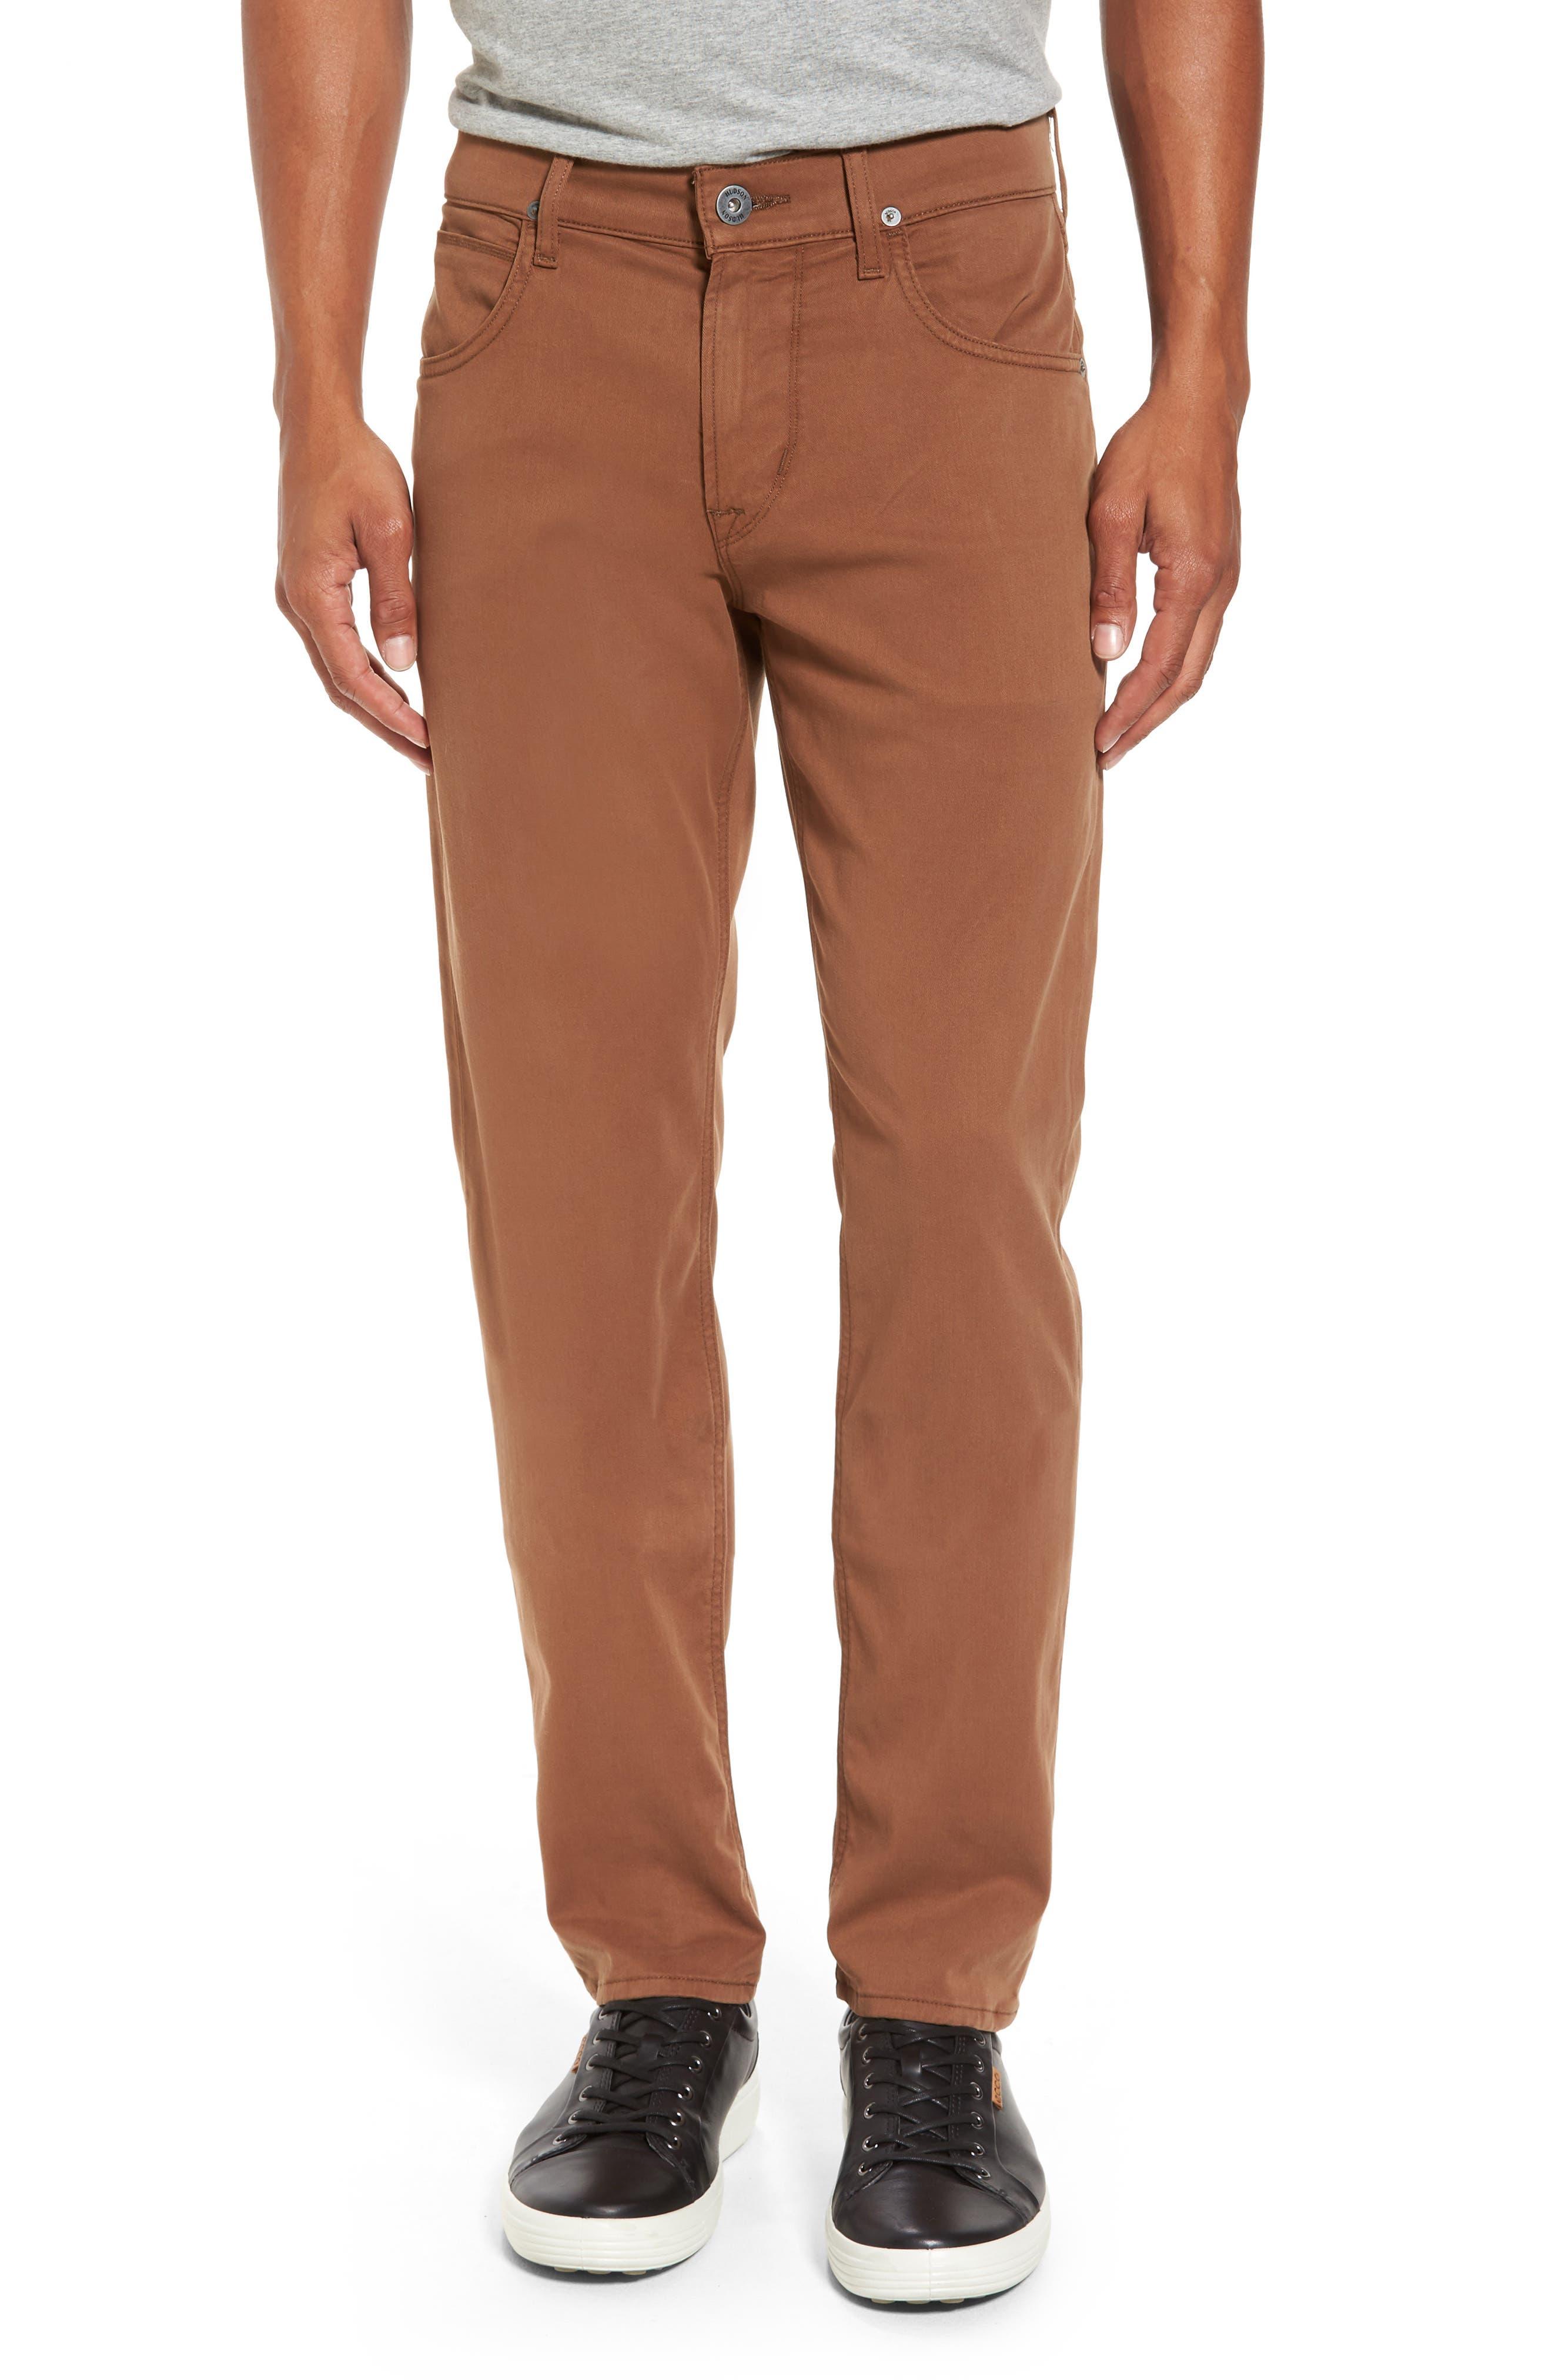 Blake Slim Fit Jeans,                             Main thumbnail 1, color,                             Masonite